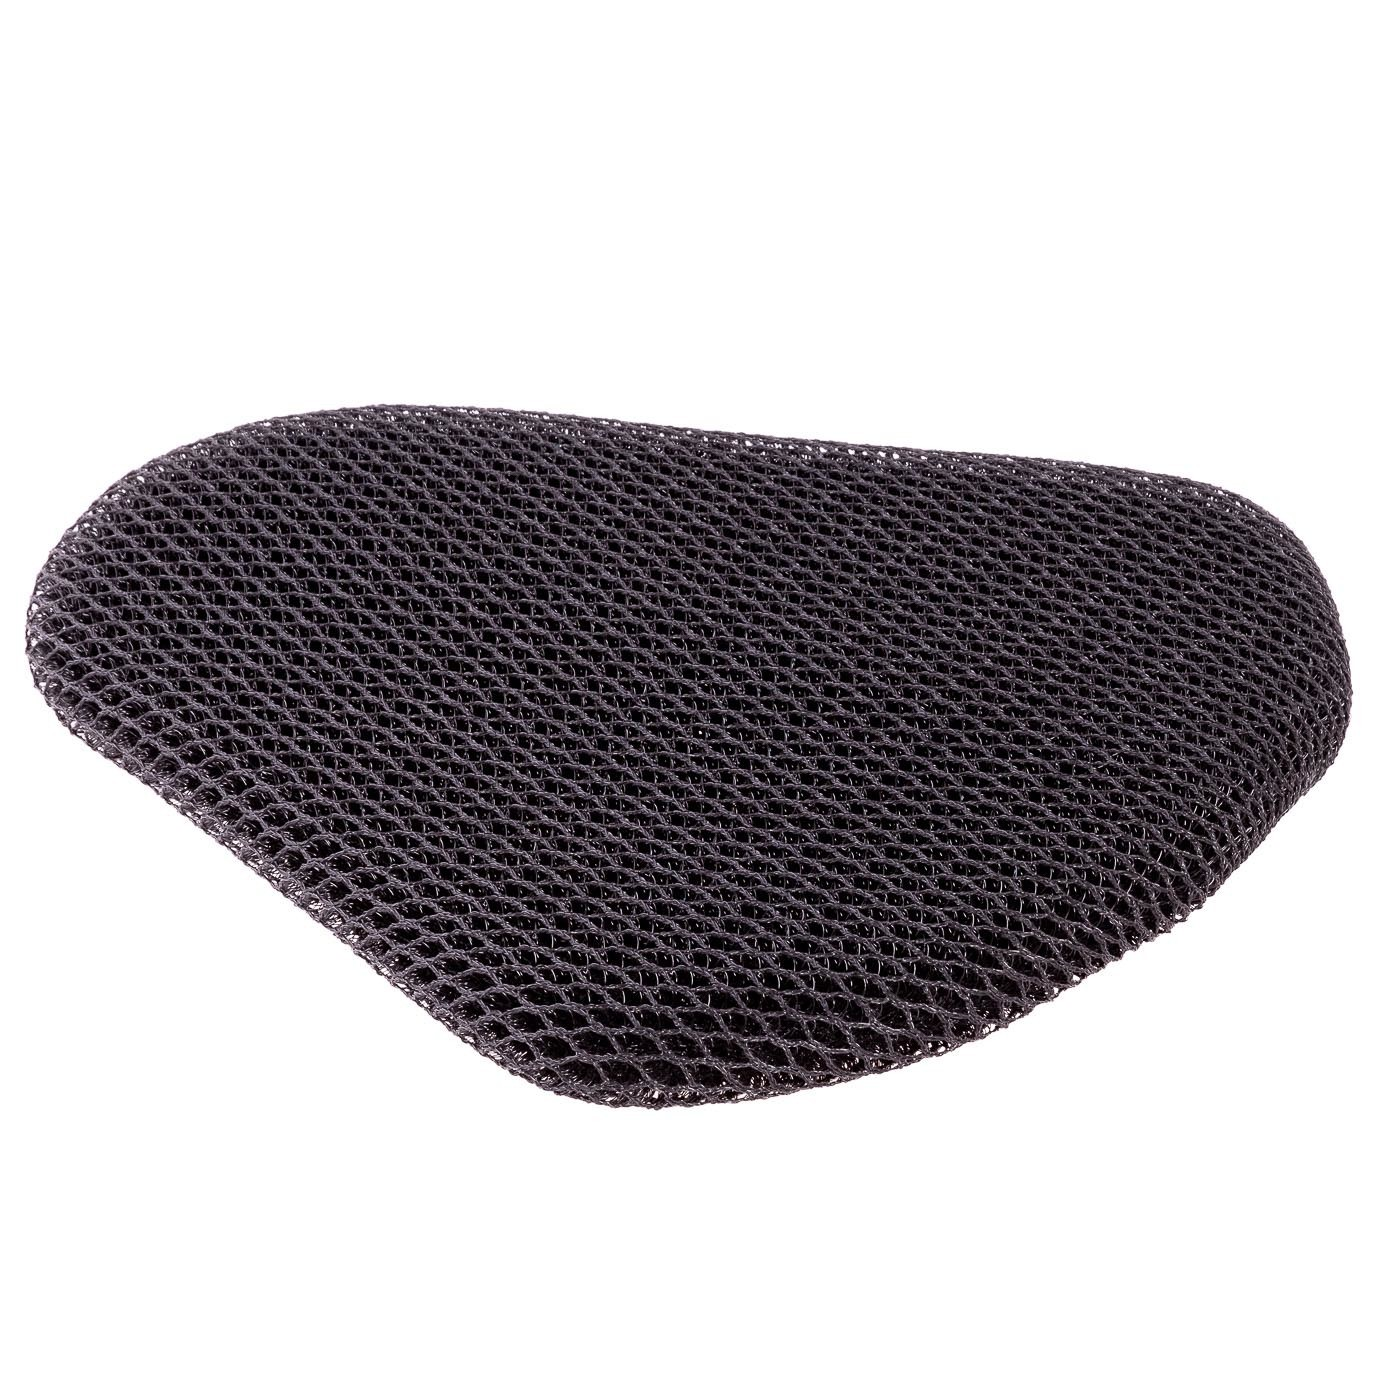 42×40/22 cm  Motorbike seat pad (M)